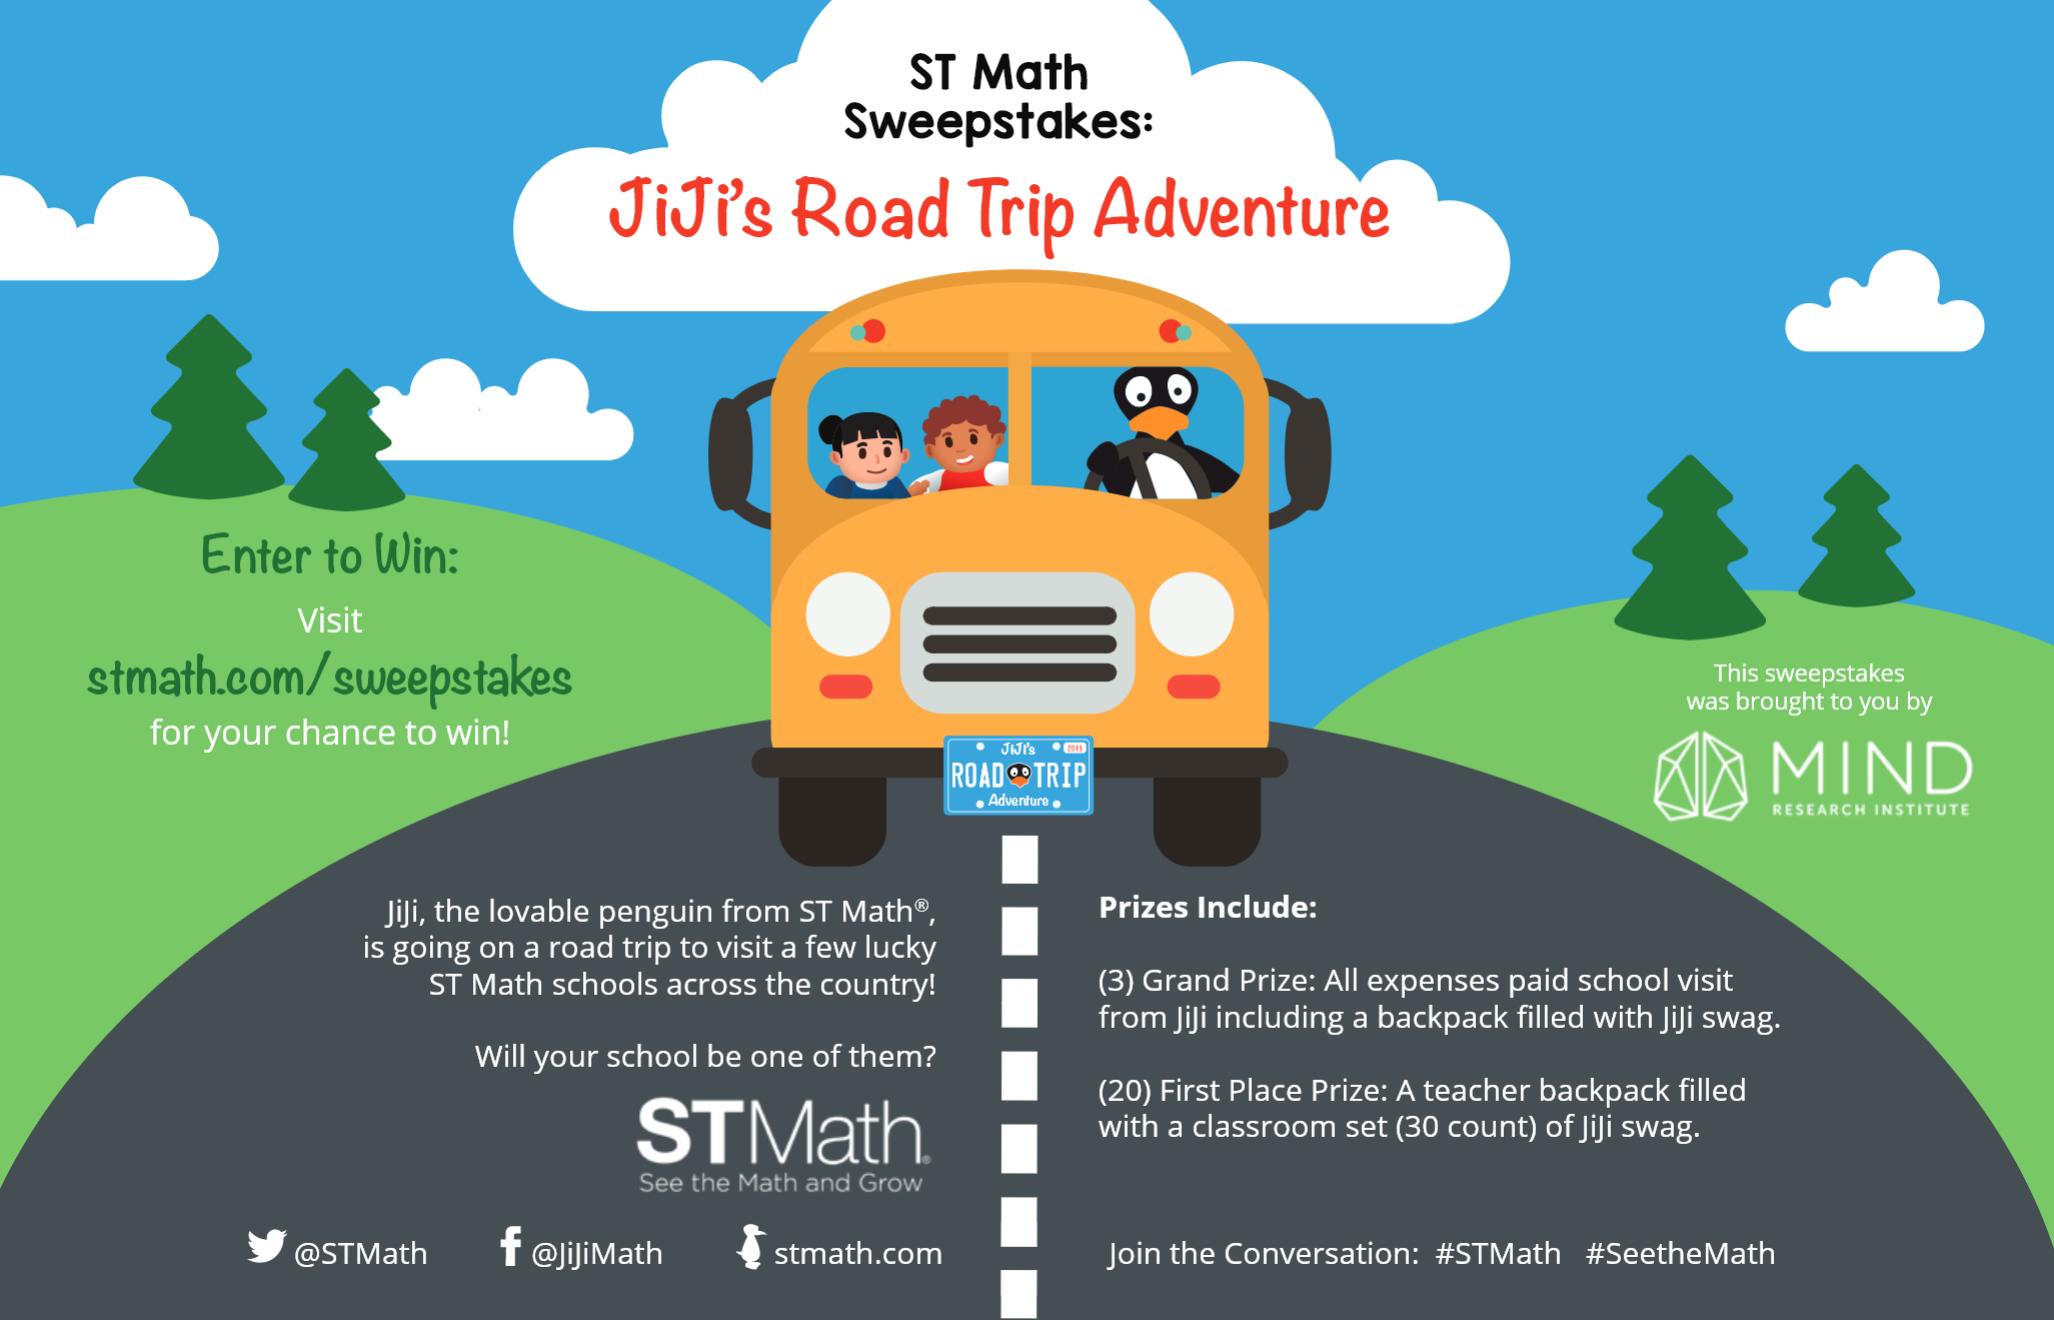 JiJi's Road Trip Adventure Flyer